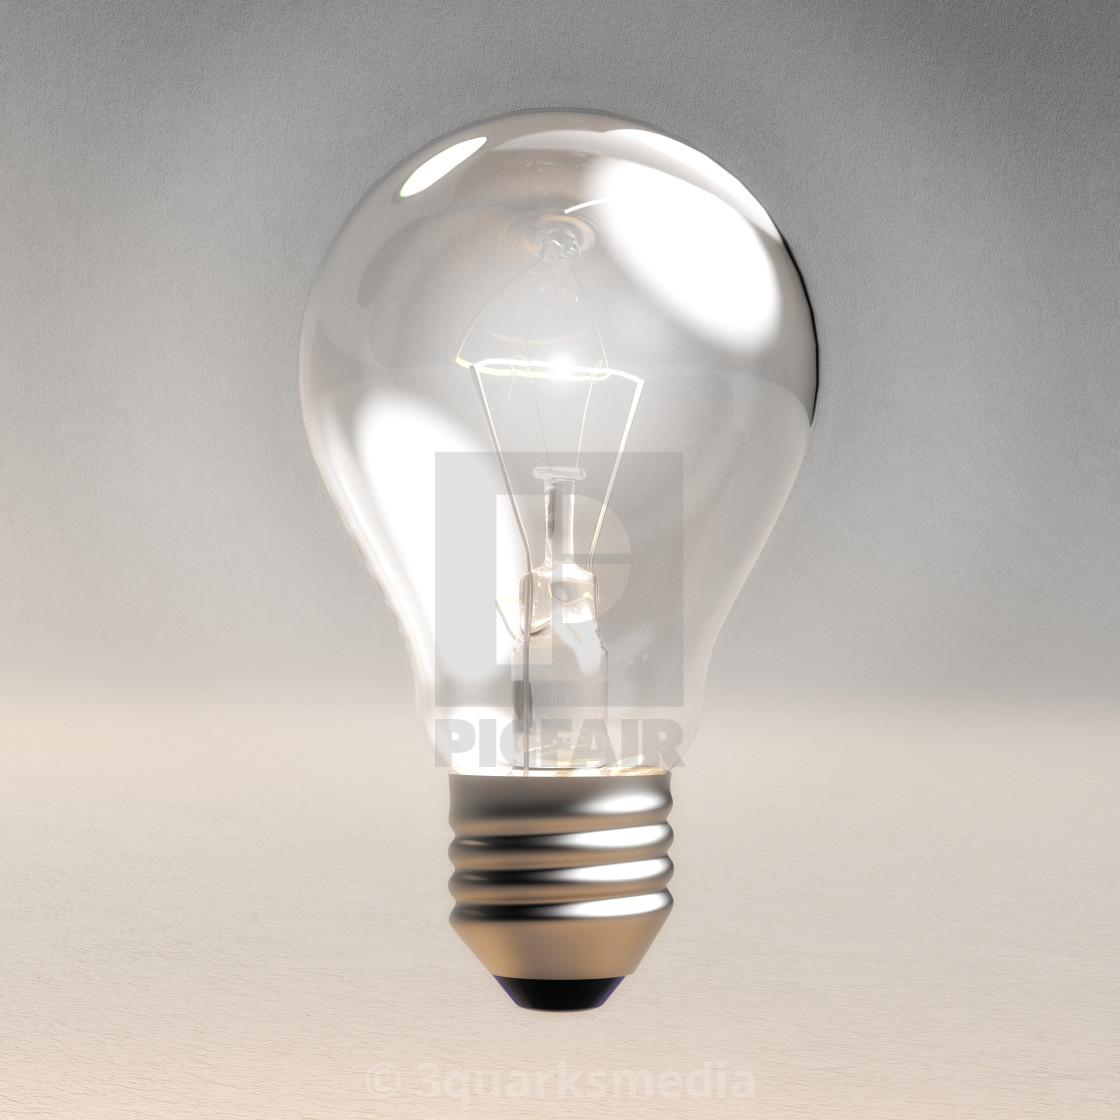 """Digital 3D Illustration of a Light Bulb"" stock image"